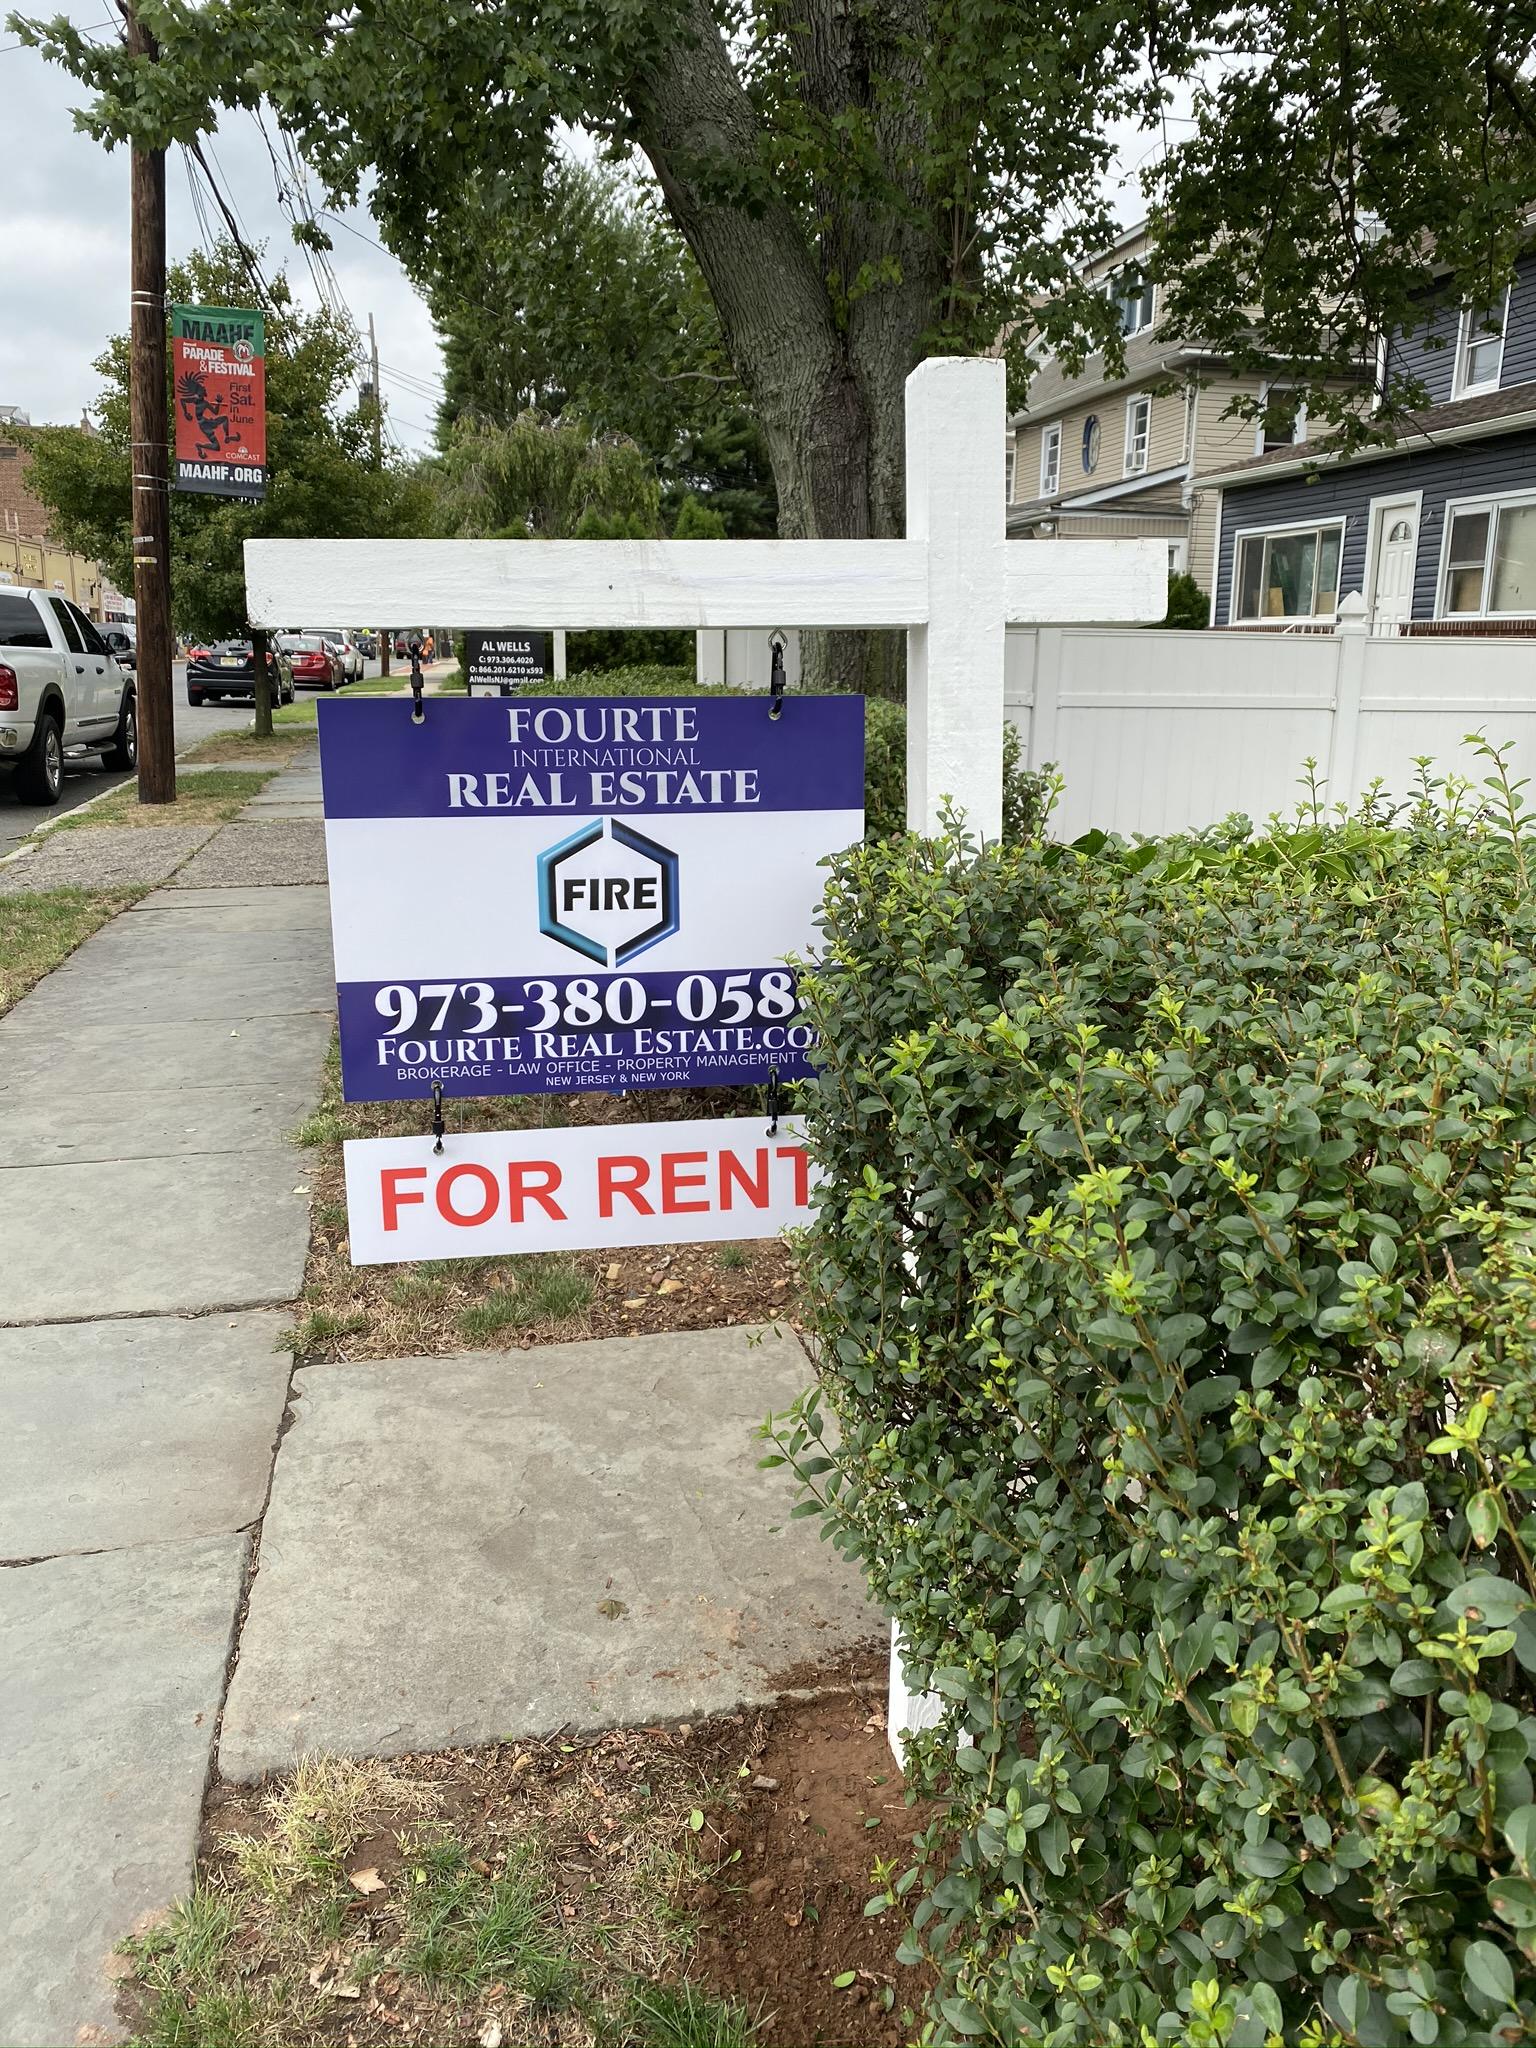 Fourte International Real Estate For Rent sign on a property managed by Fourte International Real Estate